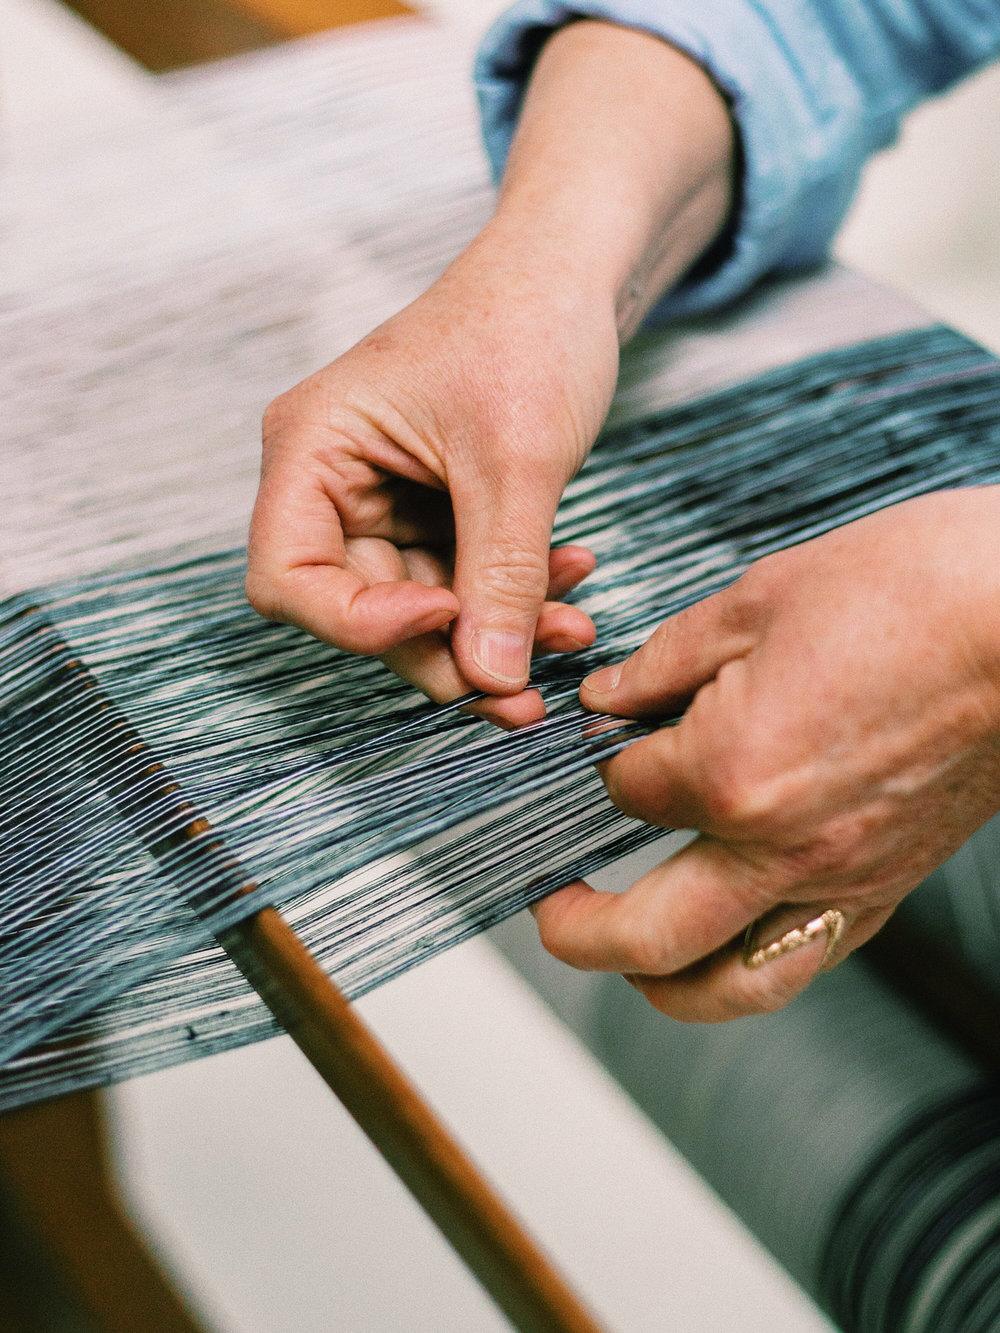 Loom Karin Carlander - Weaving with Natural Linen